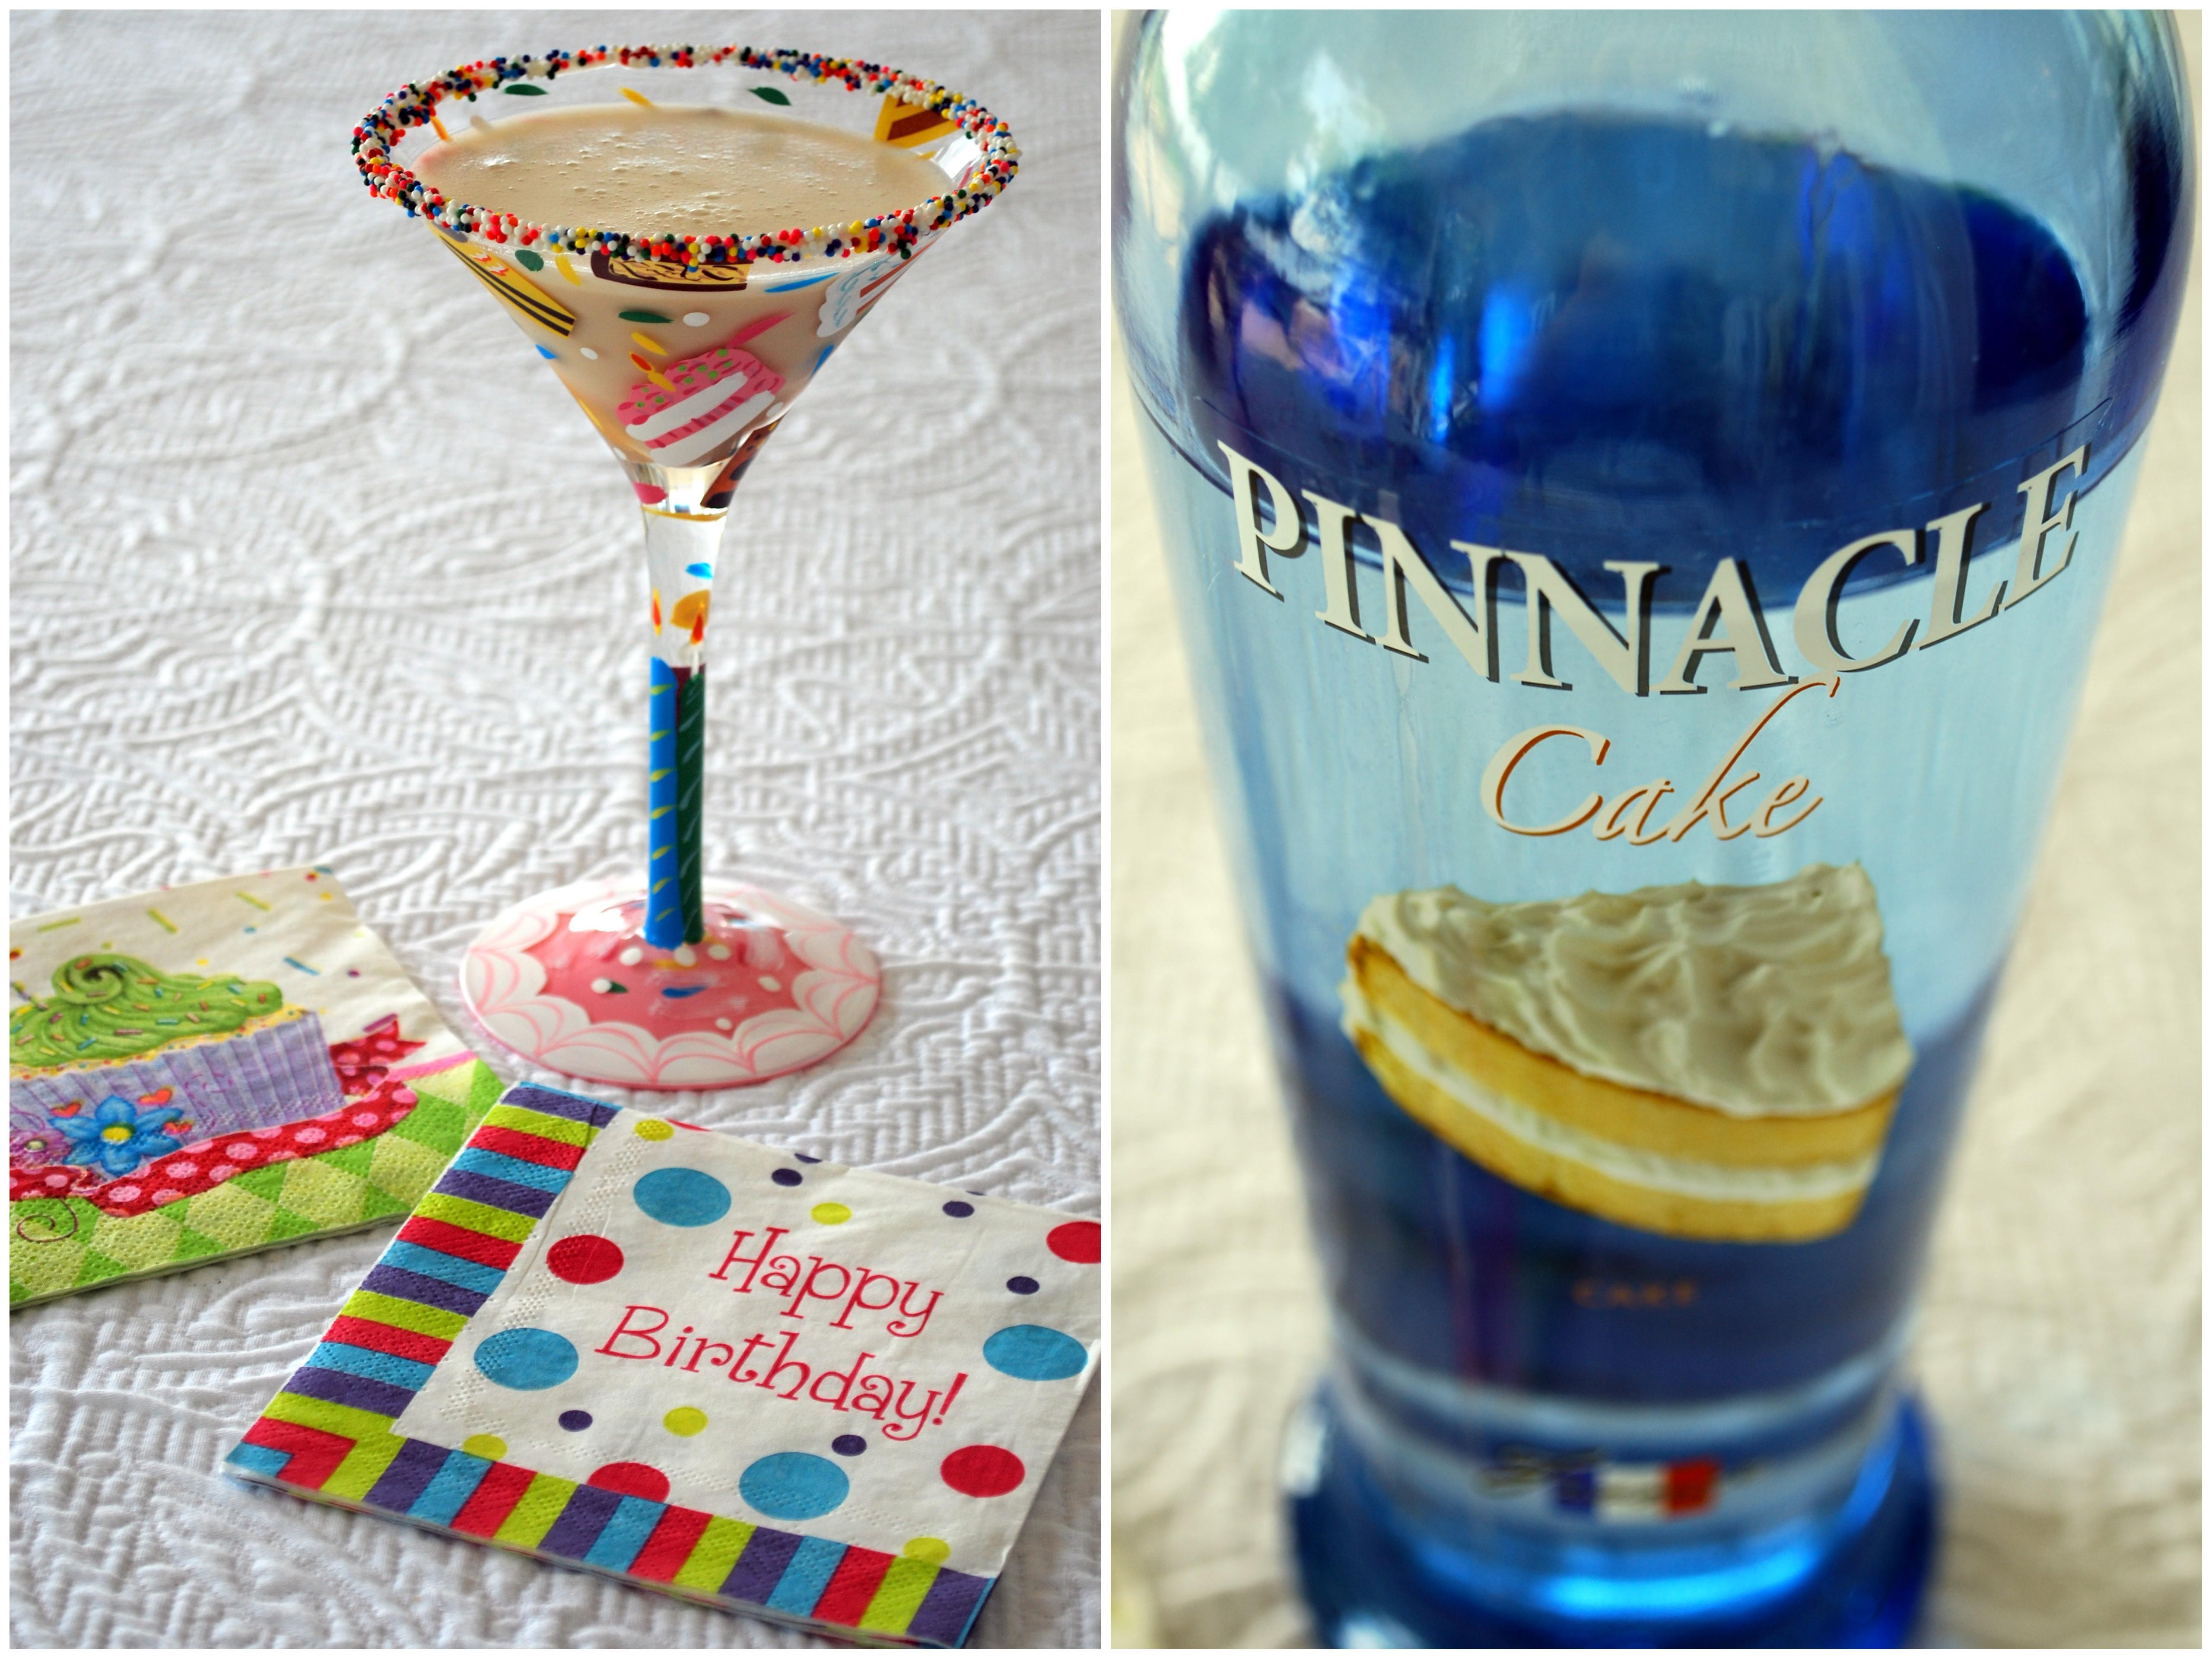 Martini Recipes Birthday Cake Martini Recipes